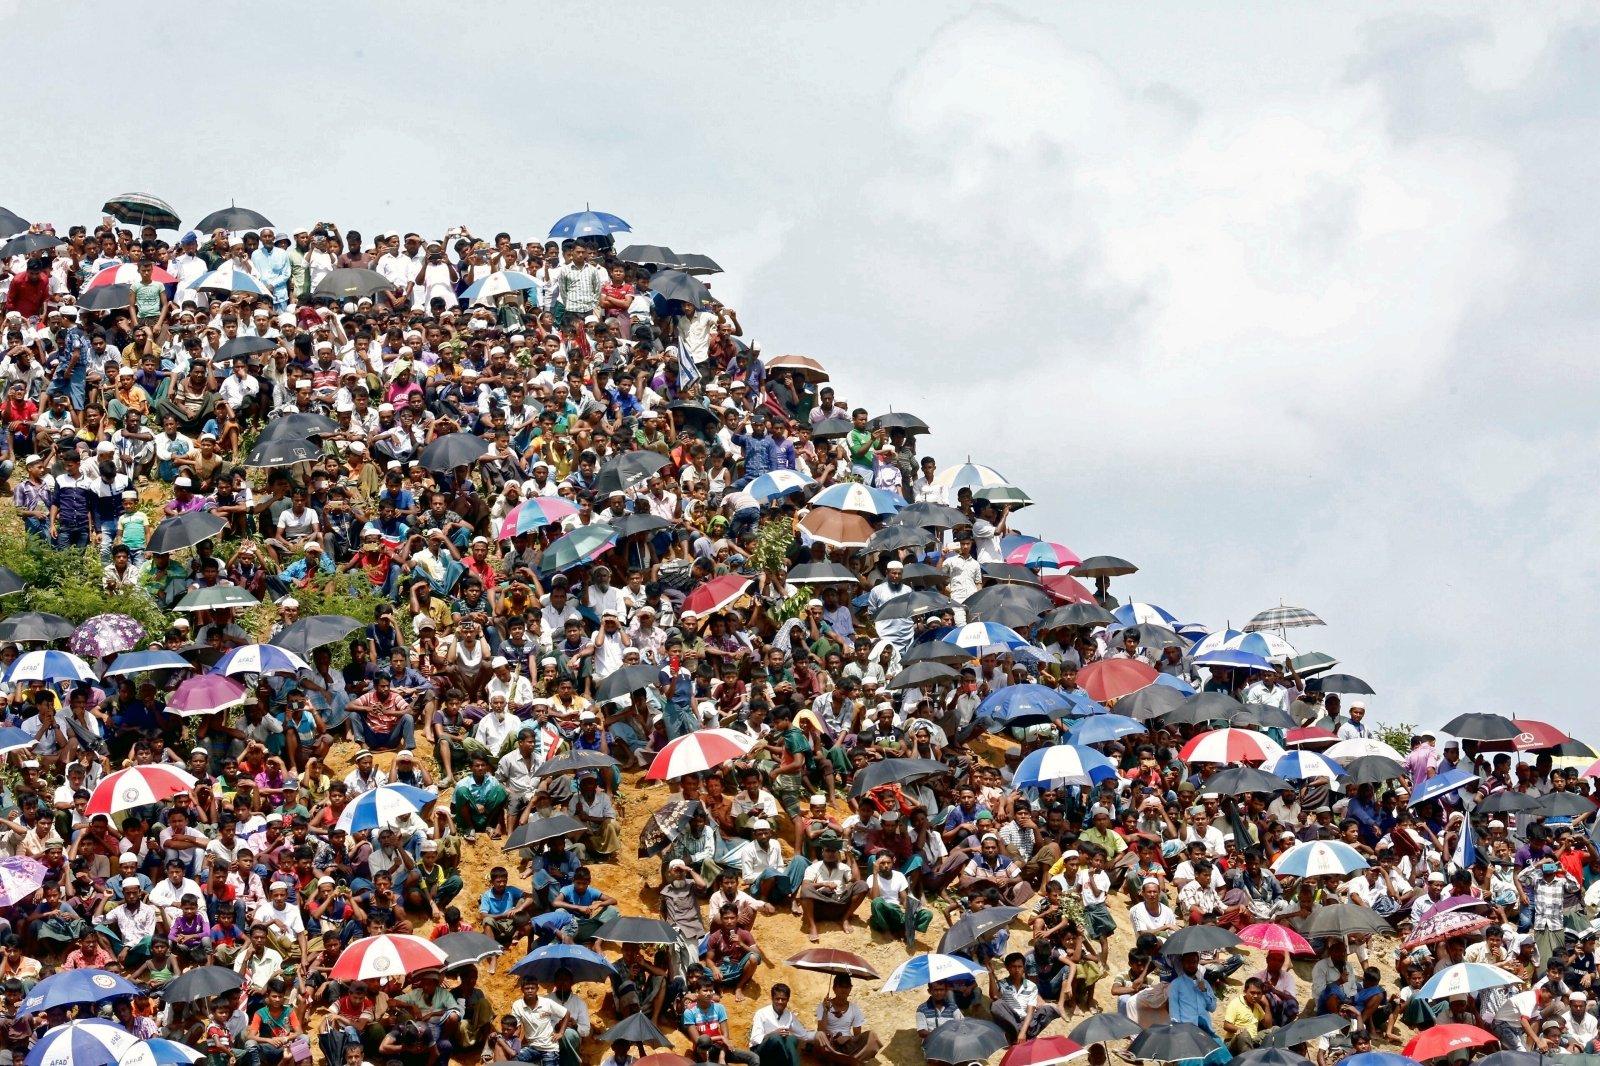 Image result for С начала года в Европу по Средиземному морю прибыло 68113 мигрантов и беженцев